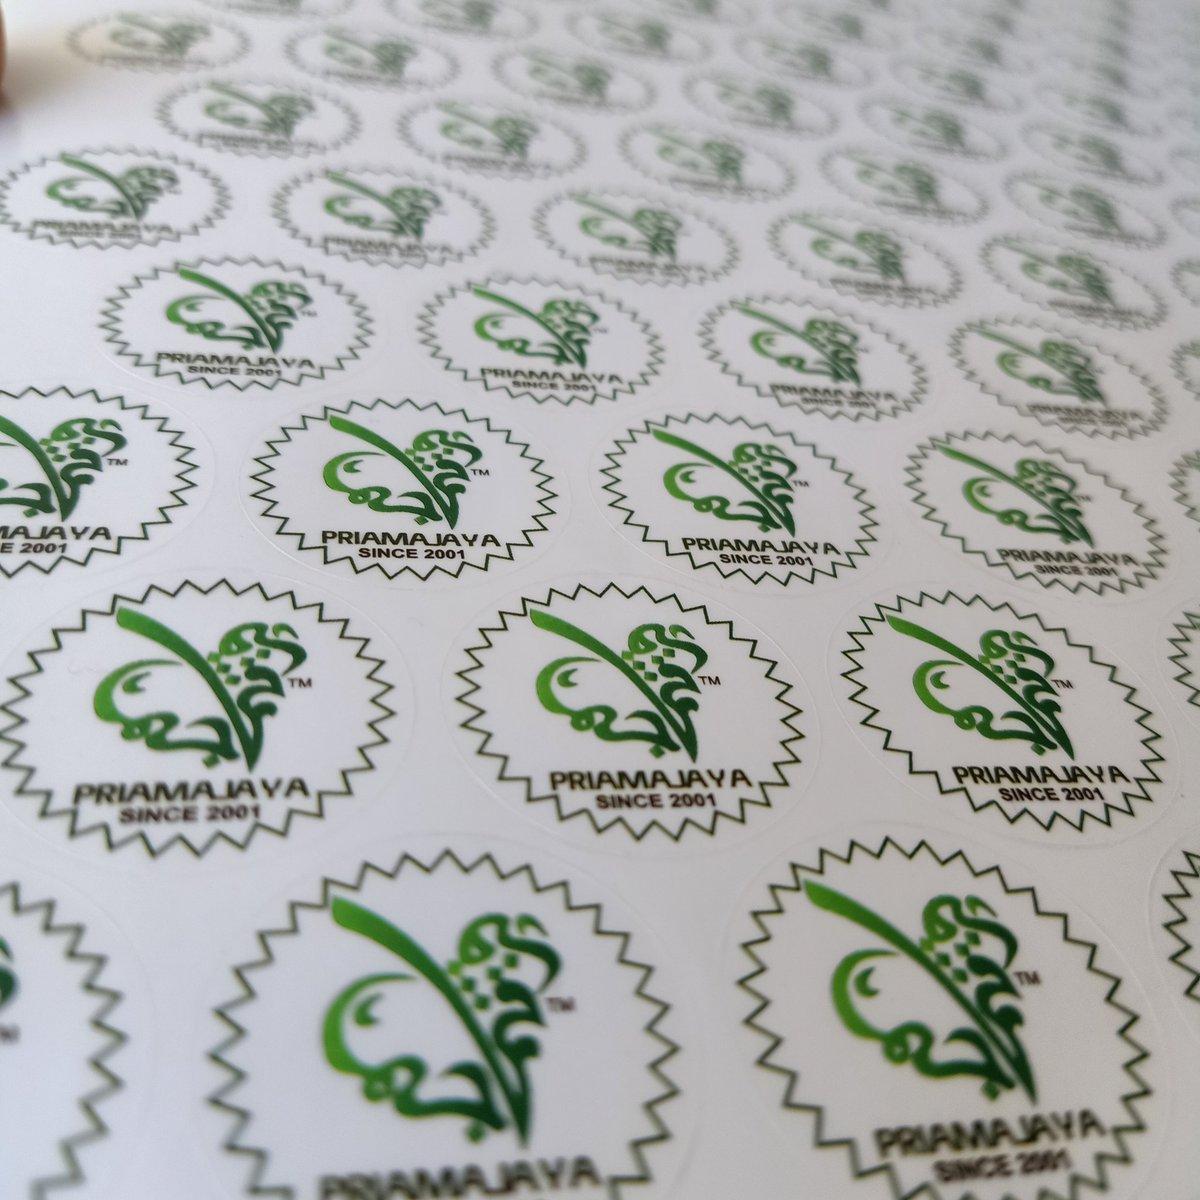 Label stiker dah siap bohh.. Transparent punya.. asikkk..  #labelsticker #stickers #digitalprinting #designmurah #transparentsticker #stikerproduk #stikermurah #koleksistiker